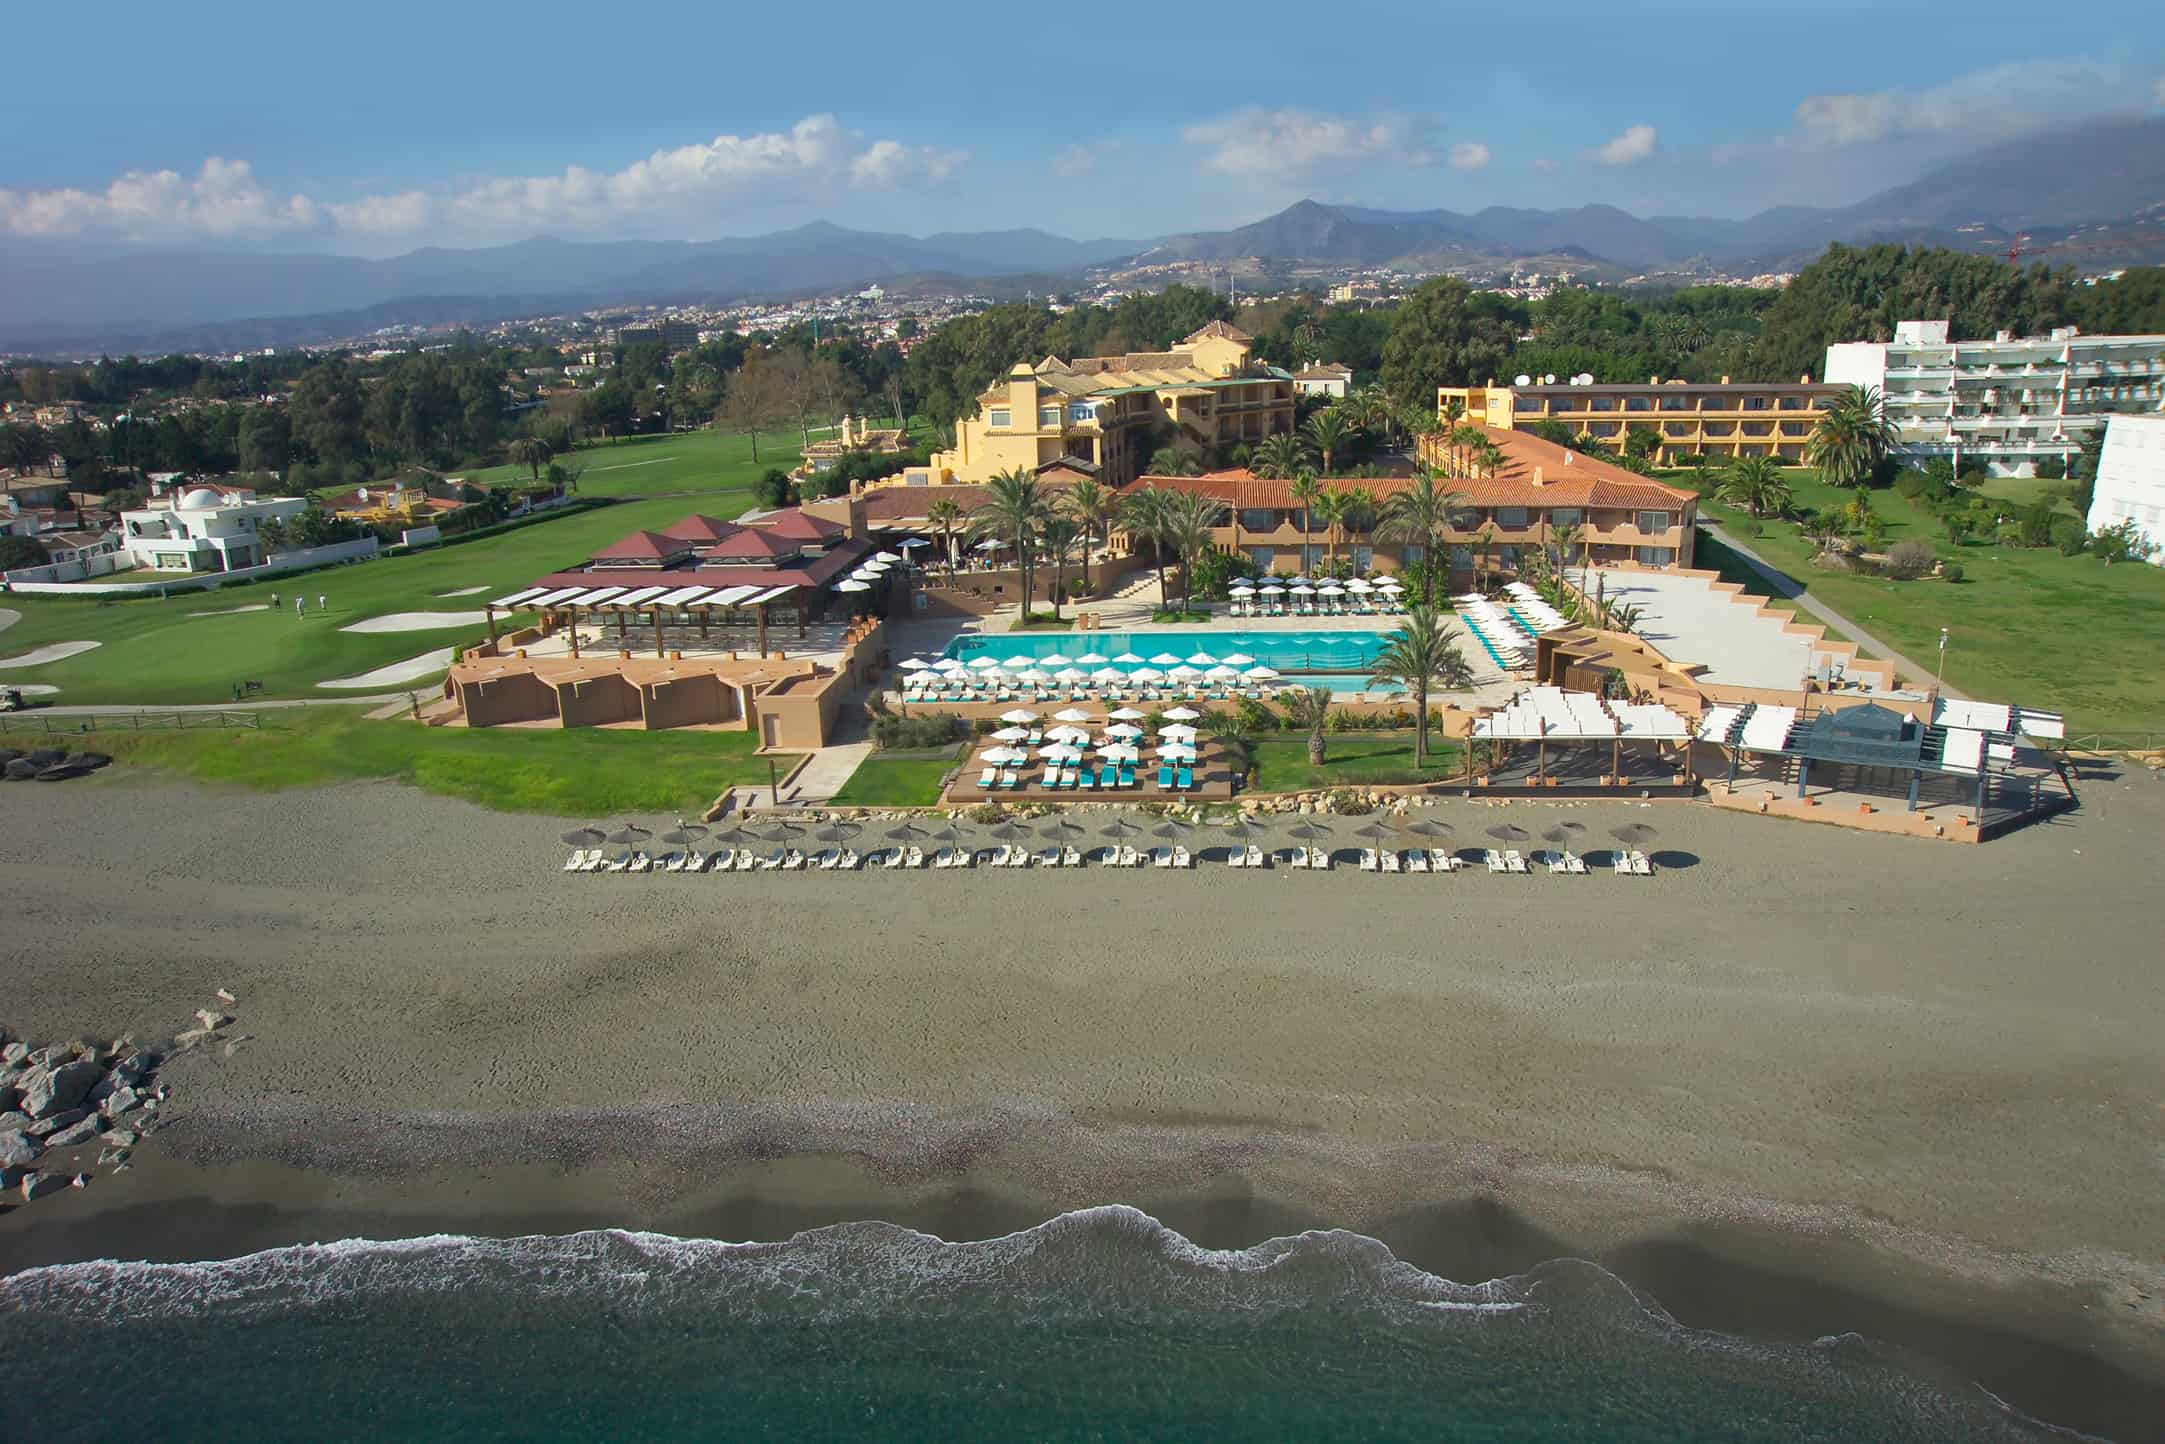 golf hotel guadalmina, marbella golf accomodation